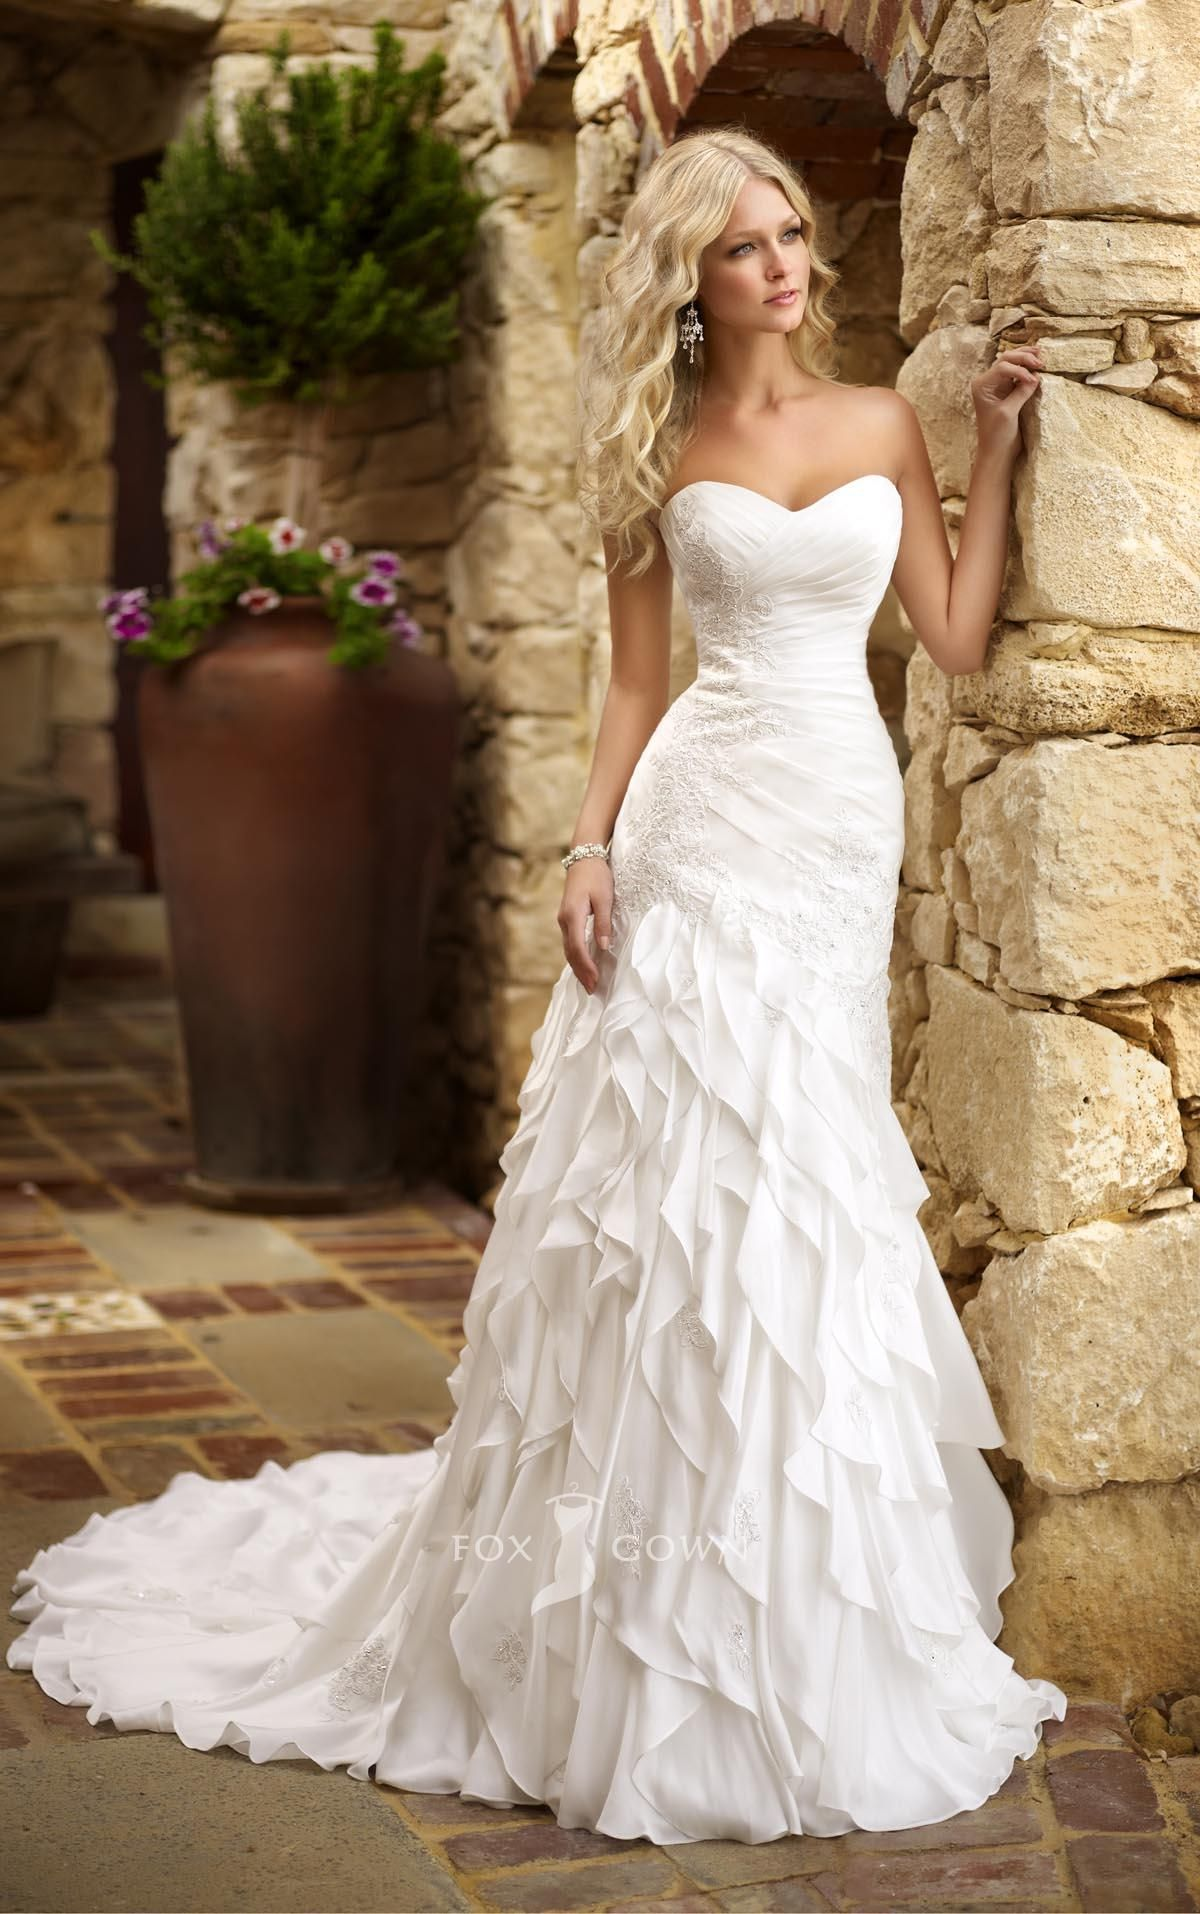 wedding dress skirt fabulous sweetheart strapless fit and flare tiered ruffle skirt wedding dress